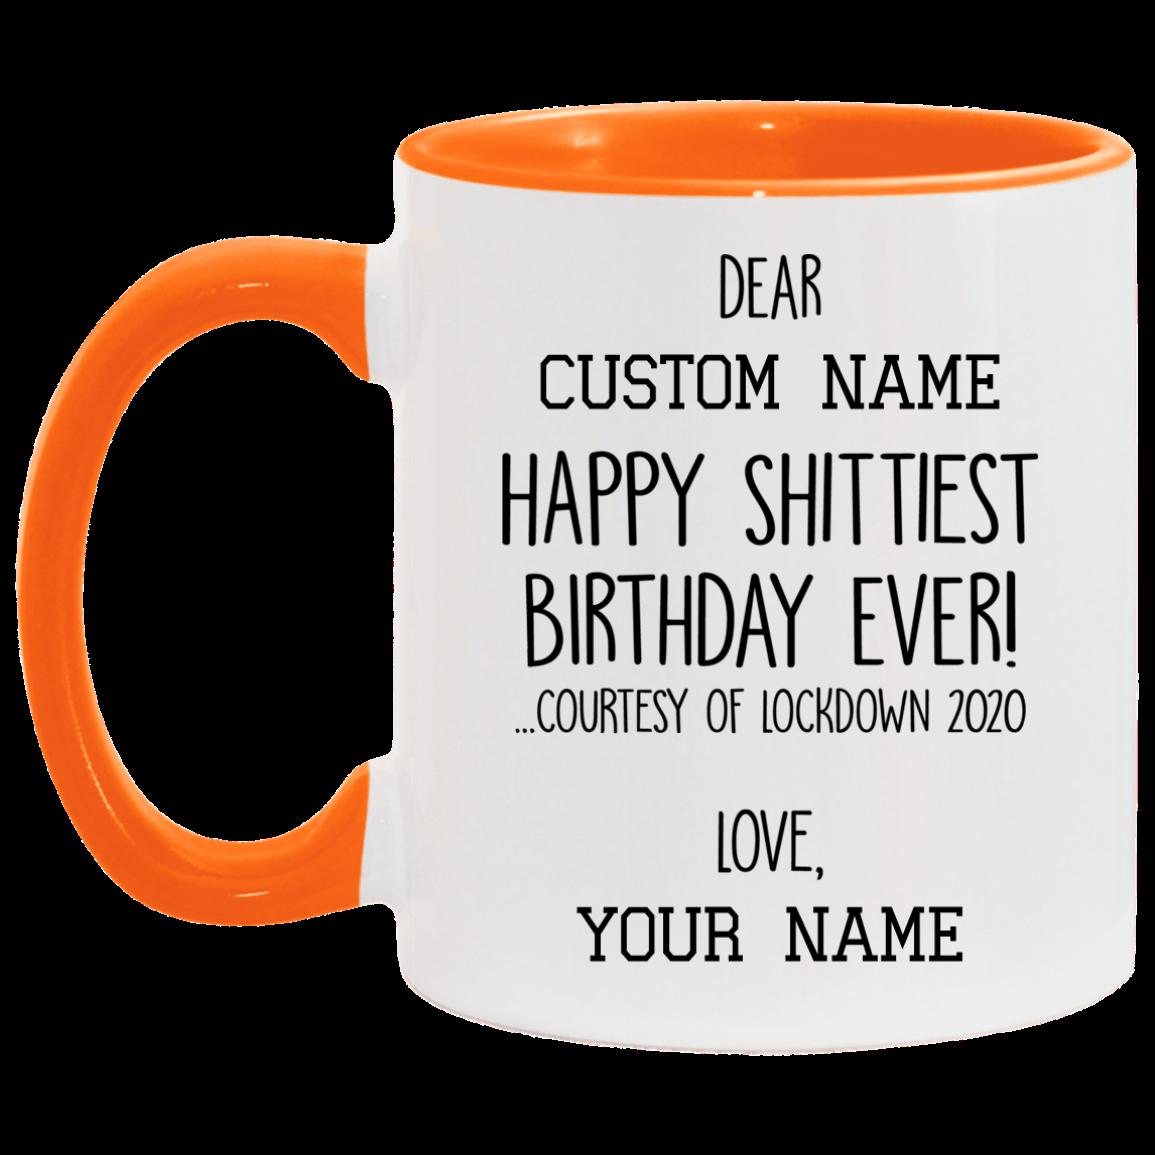 Personalized Mug Happy Shittiest Birthday Ever Courtesy Of